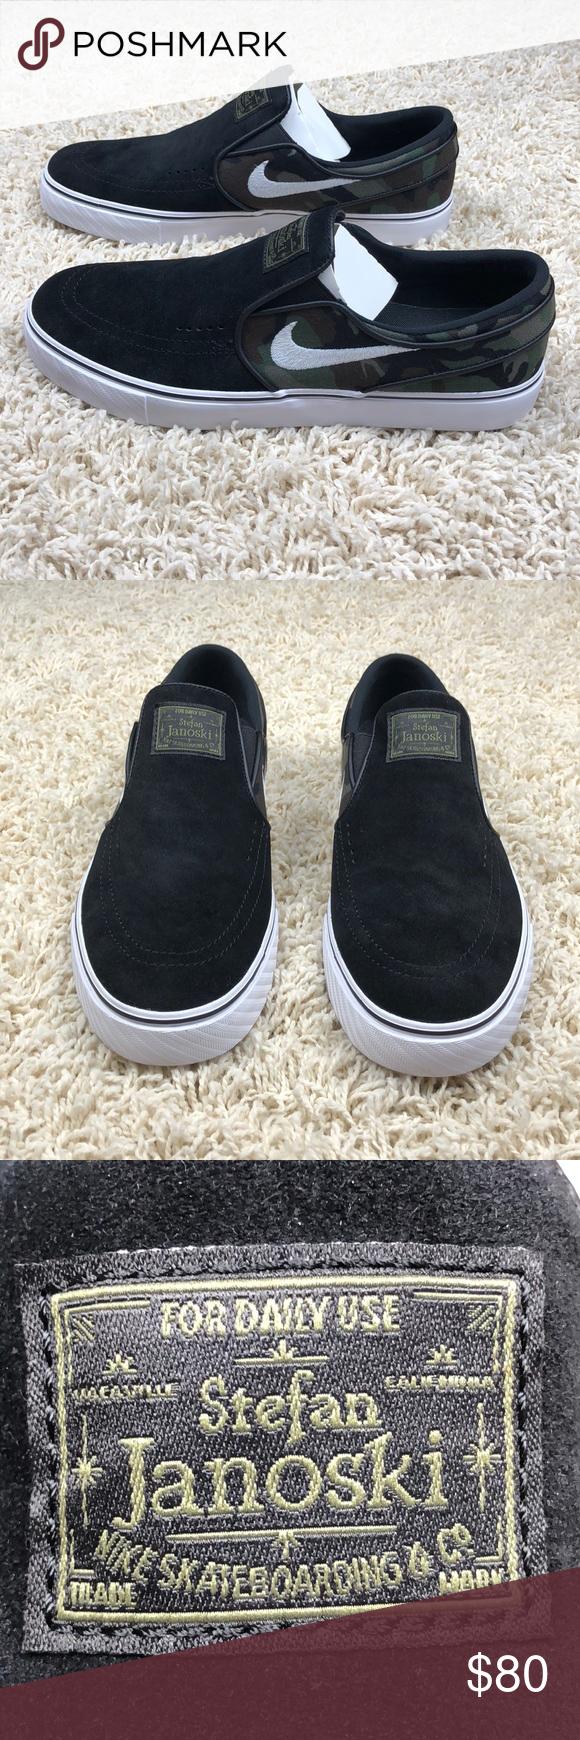 new arrivals aa687 0181b Nike SB Zoom Stefan Janoski Slip On Camo 9.5 New Without Box! Nike Zoom  Stefan Janoski Slip On Skateboard Shoes. Rare! Camouflage With Black    White.